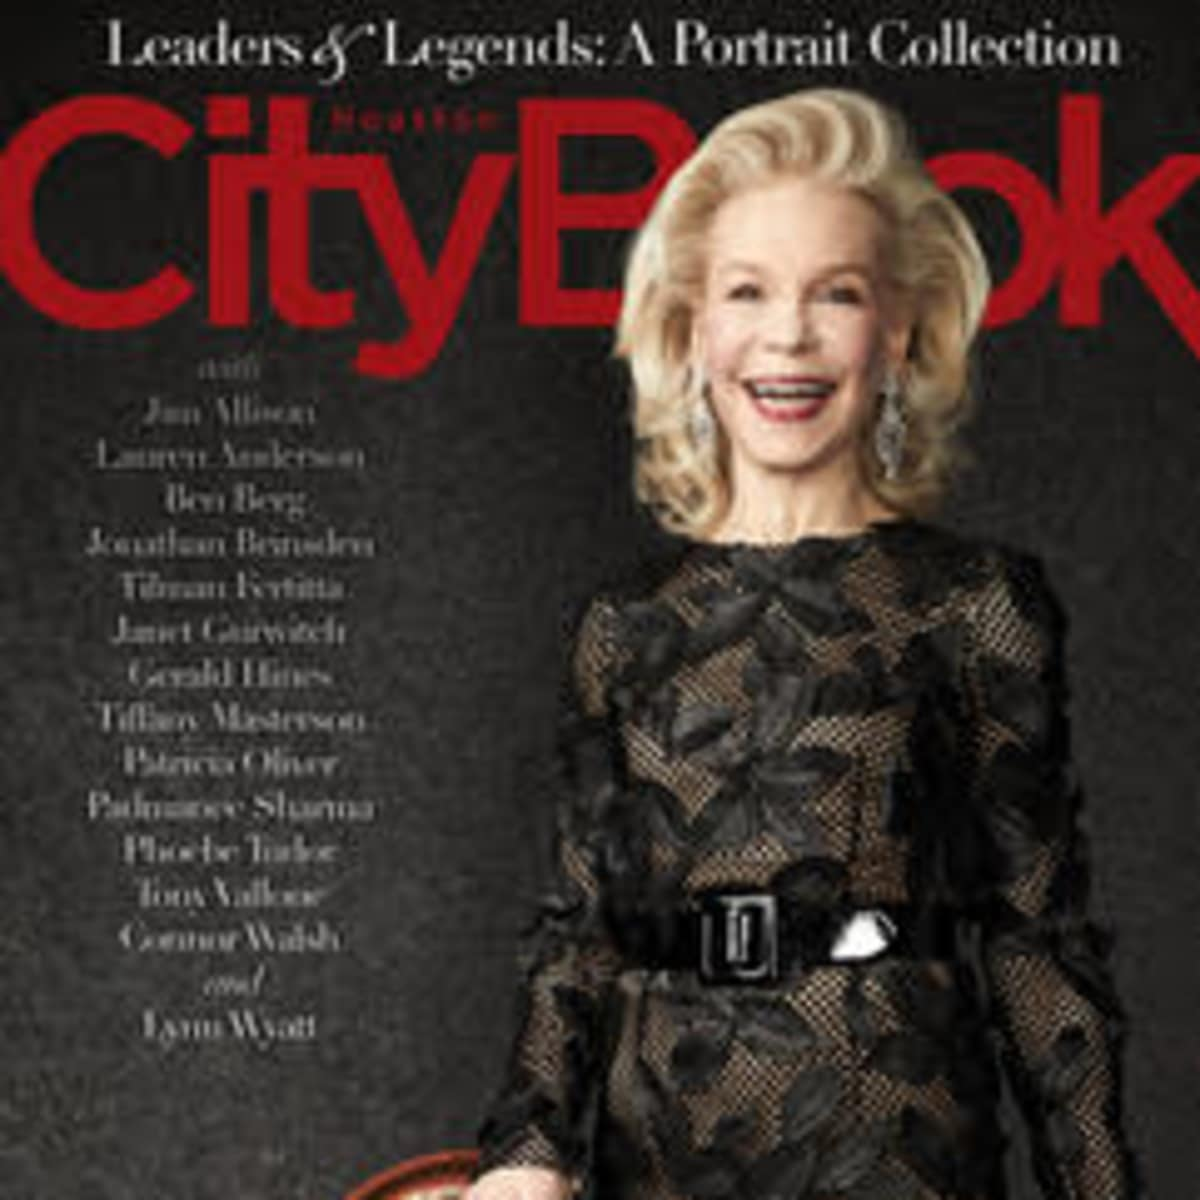 CityBook April 2018 cover Lynn Wyatt